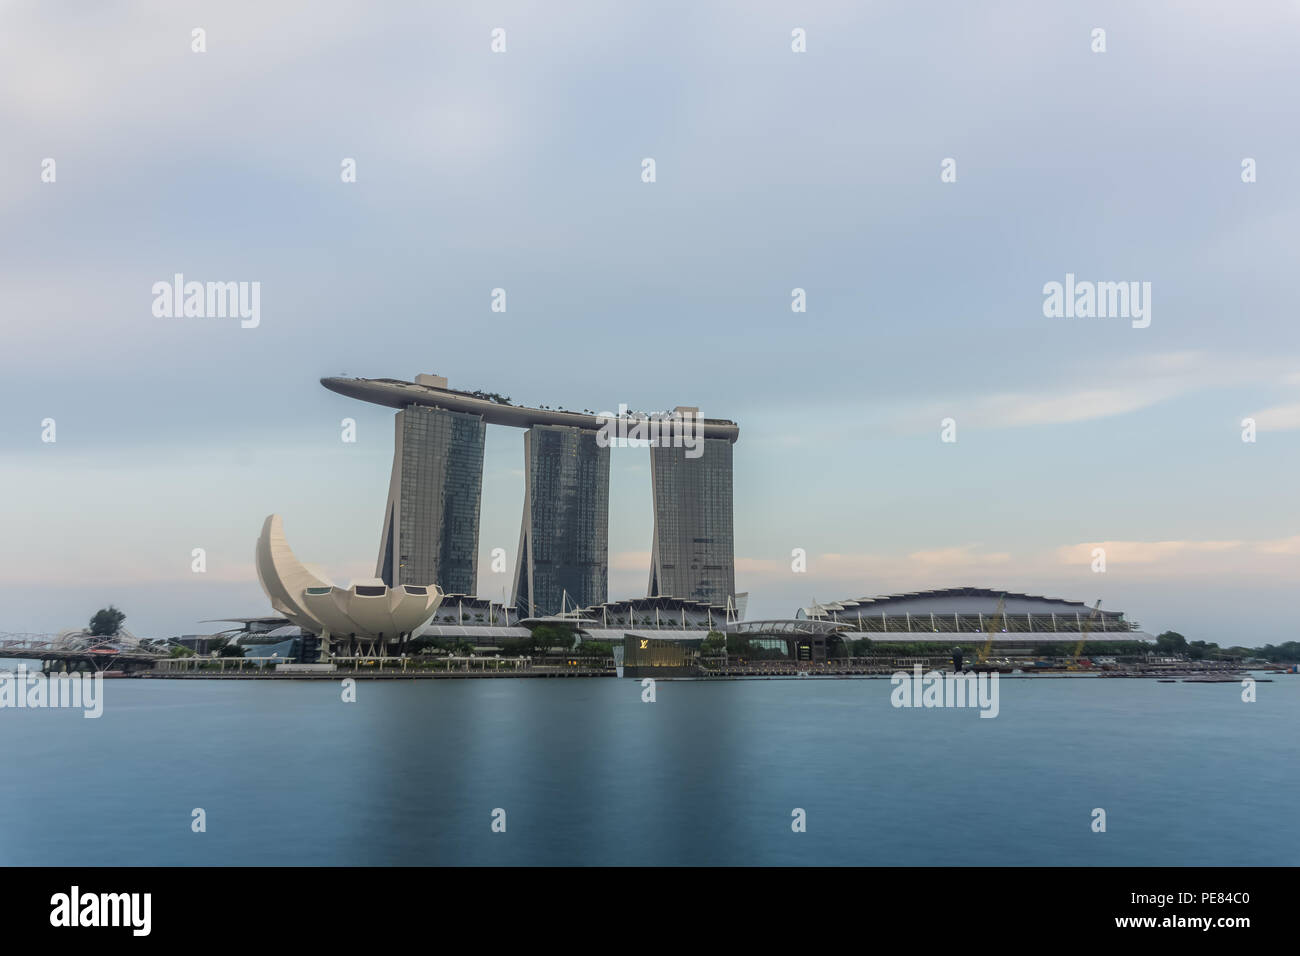 Marina Bay Sands at Marina bay, Singapore. - Stock Image